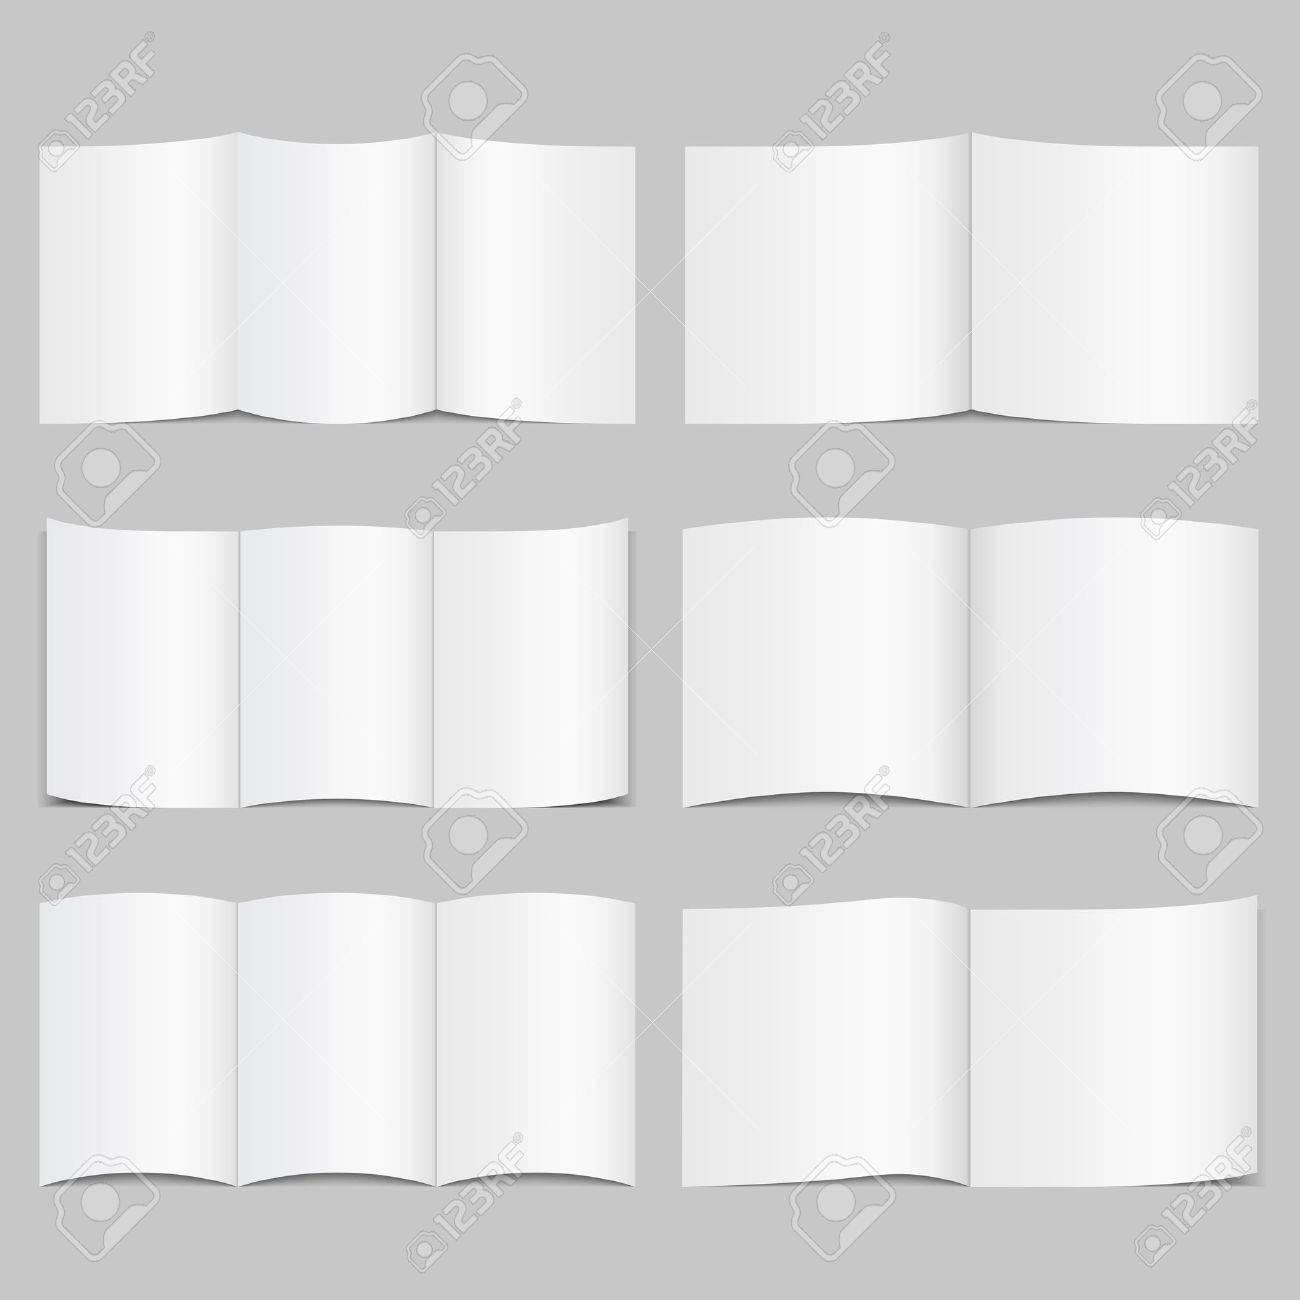 Brochure templates Stock Vector - 13516709